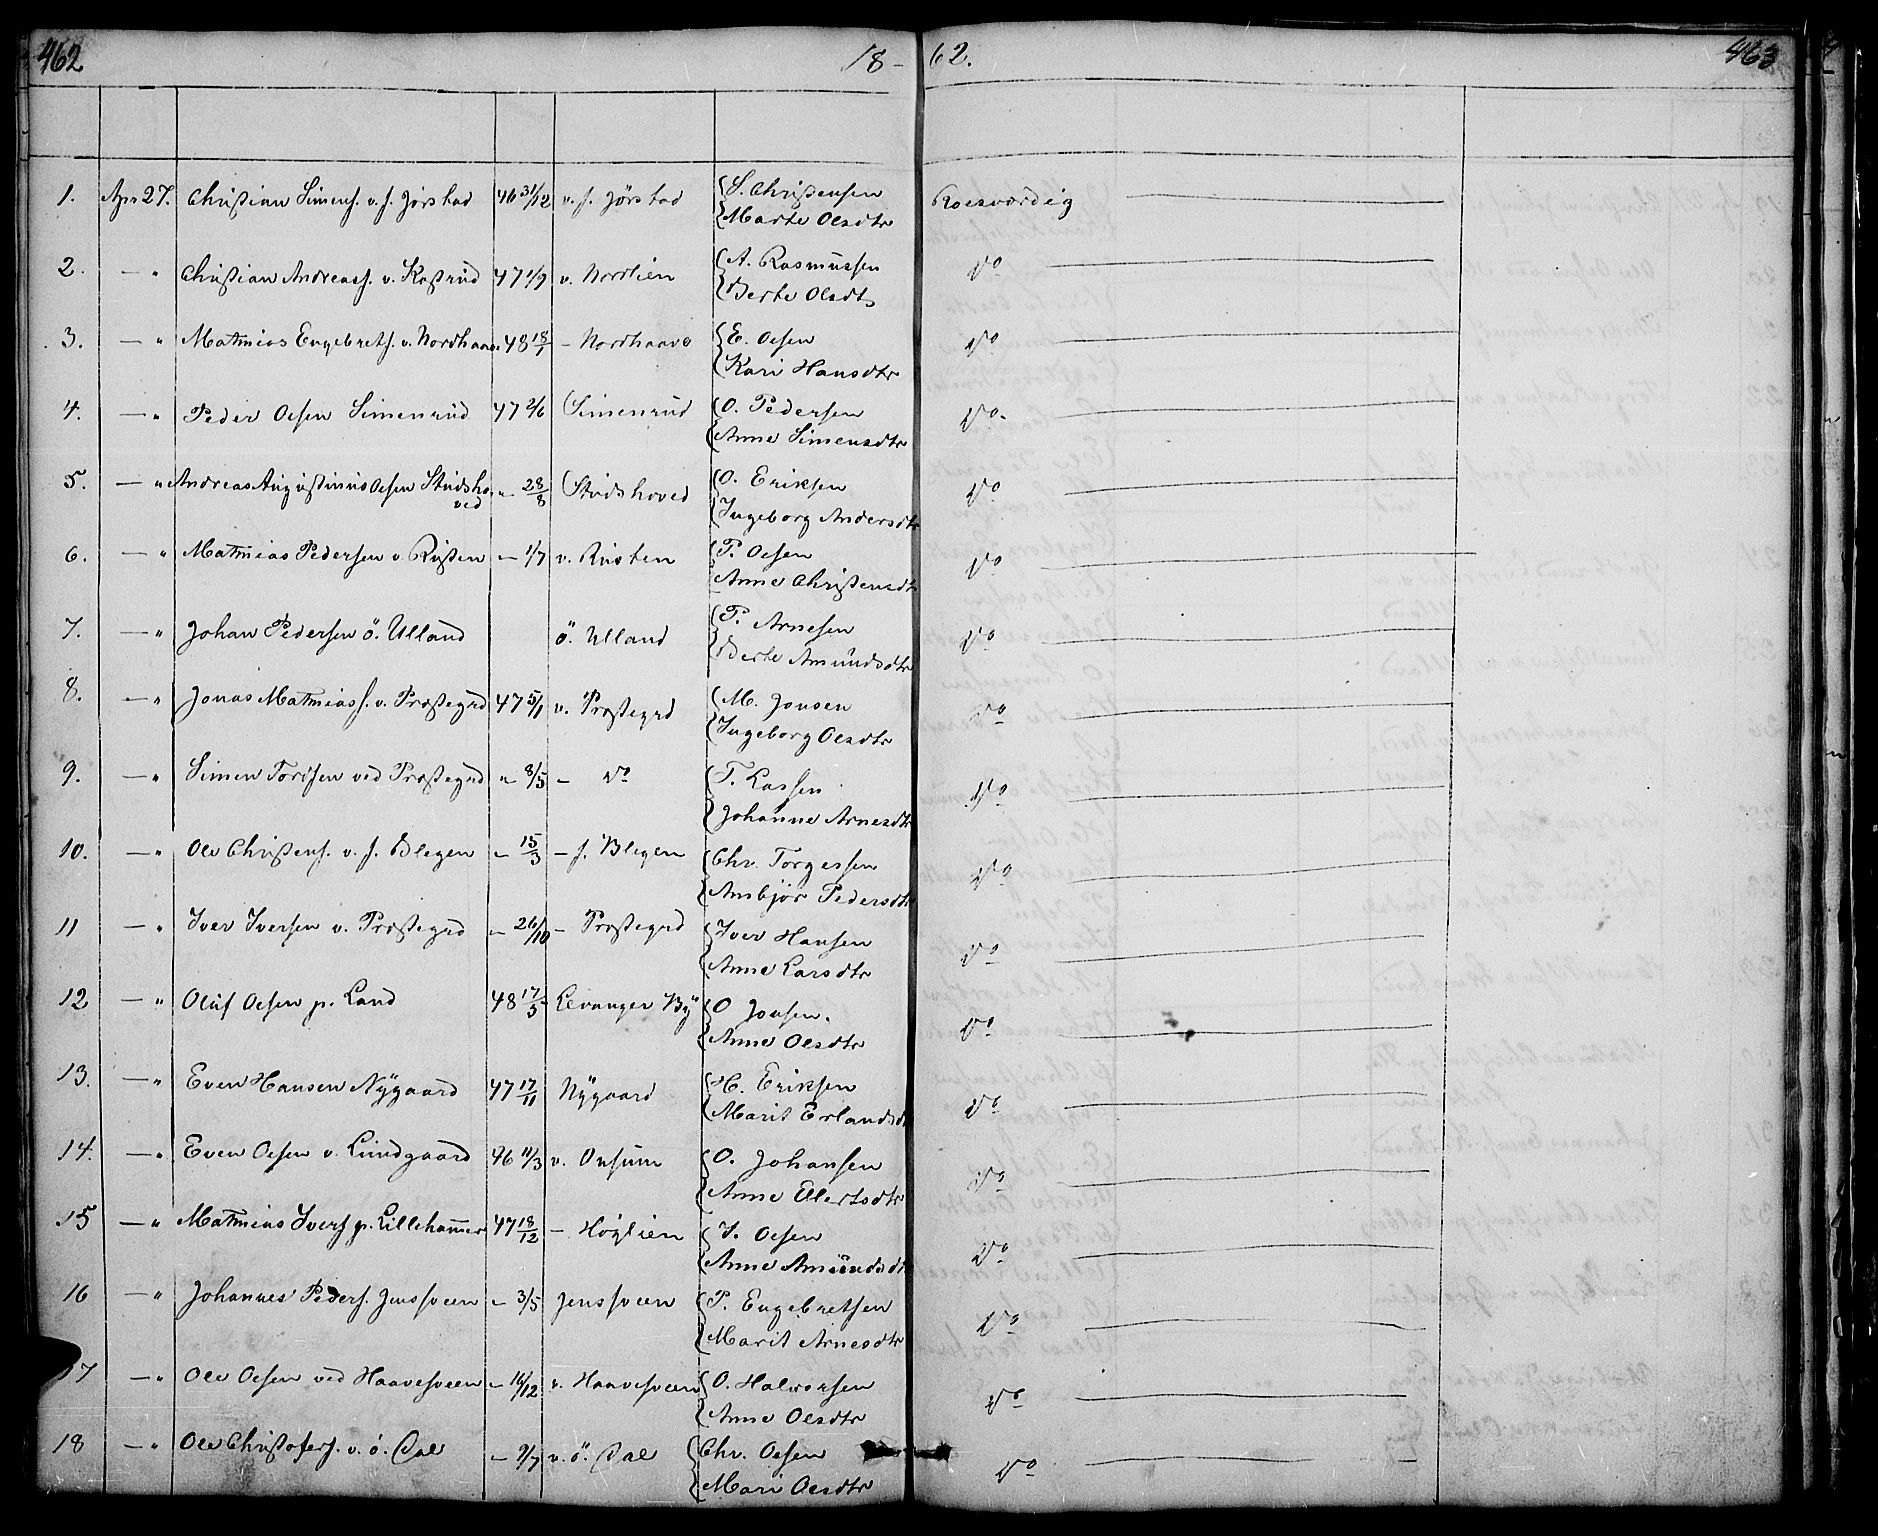 SAH, Fåberg prestekontor, Klokkerbok nr. 5, 1837-1864, s. 462-463